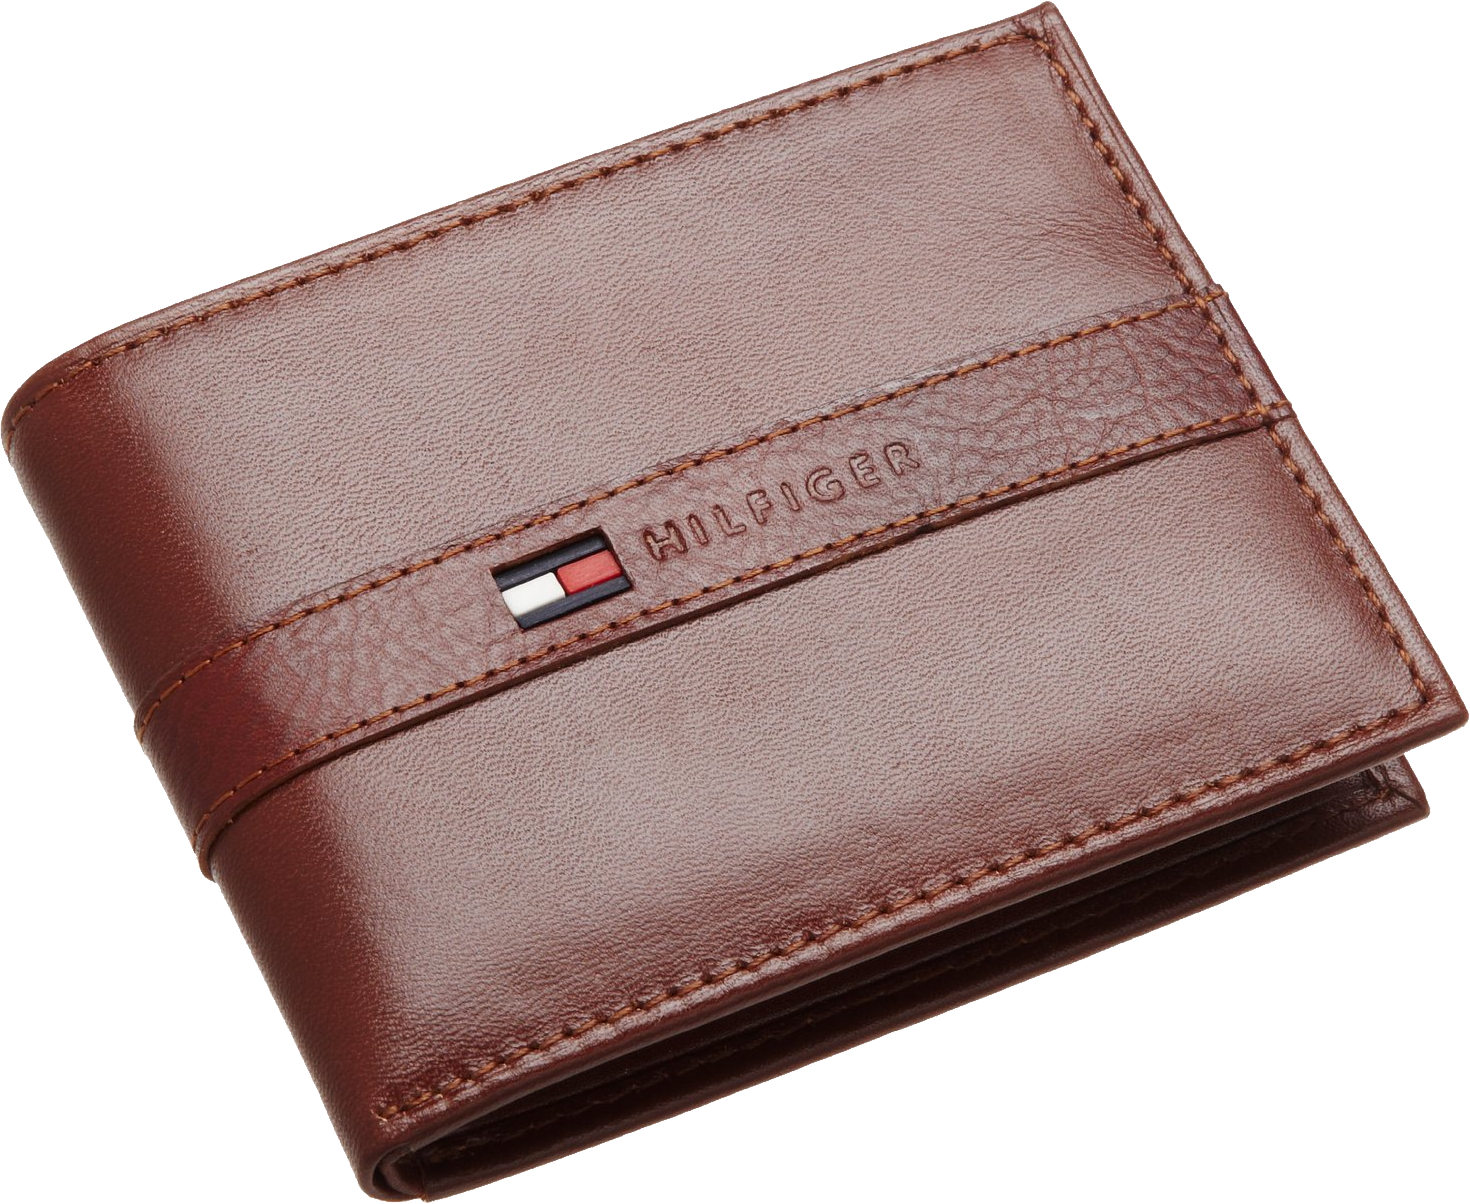 Wallet clipart leather wallet. Hq png transparent images